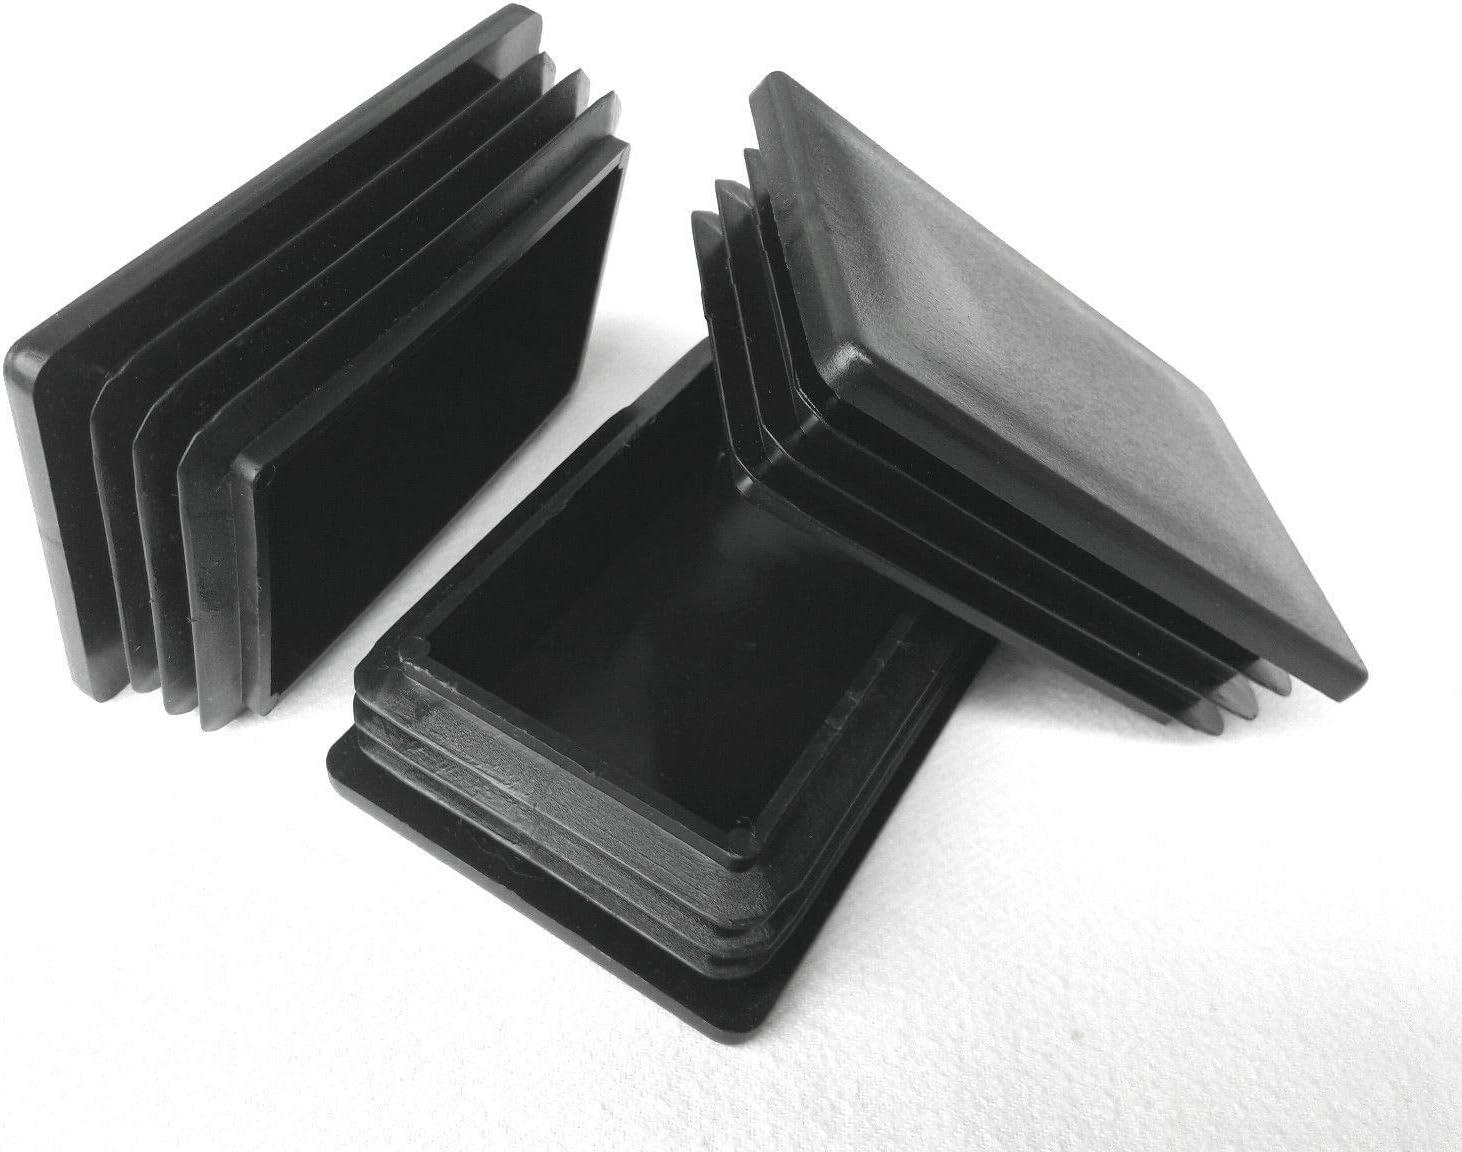 5 tappi rettangolari per tubi 10 x 20 mm.